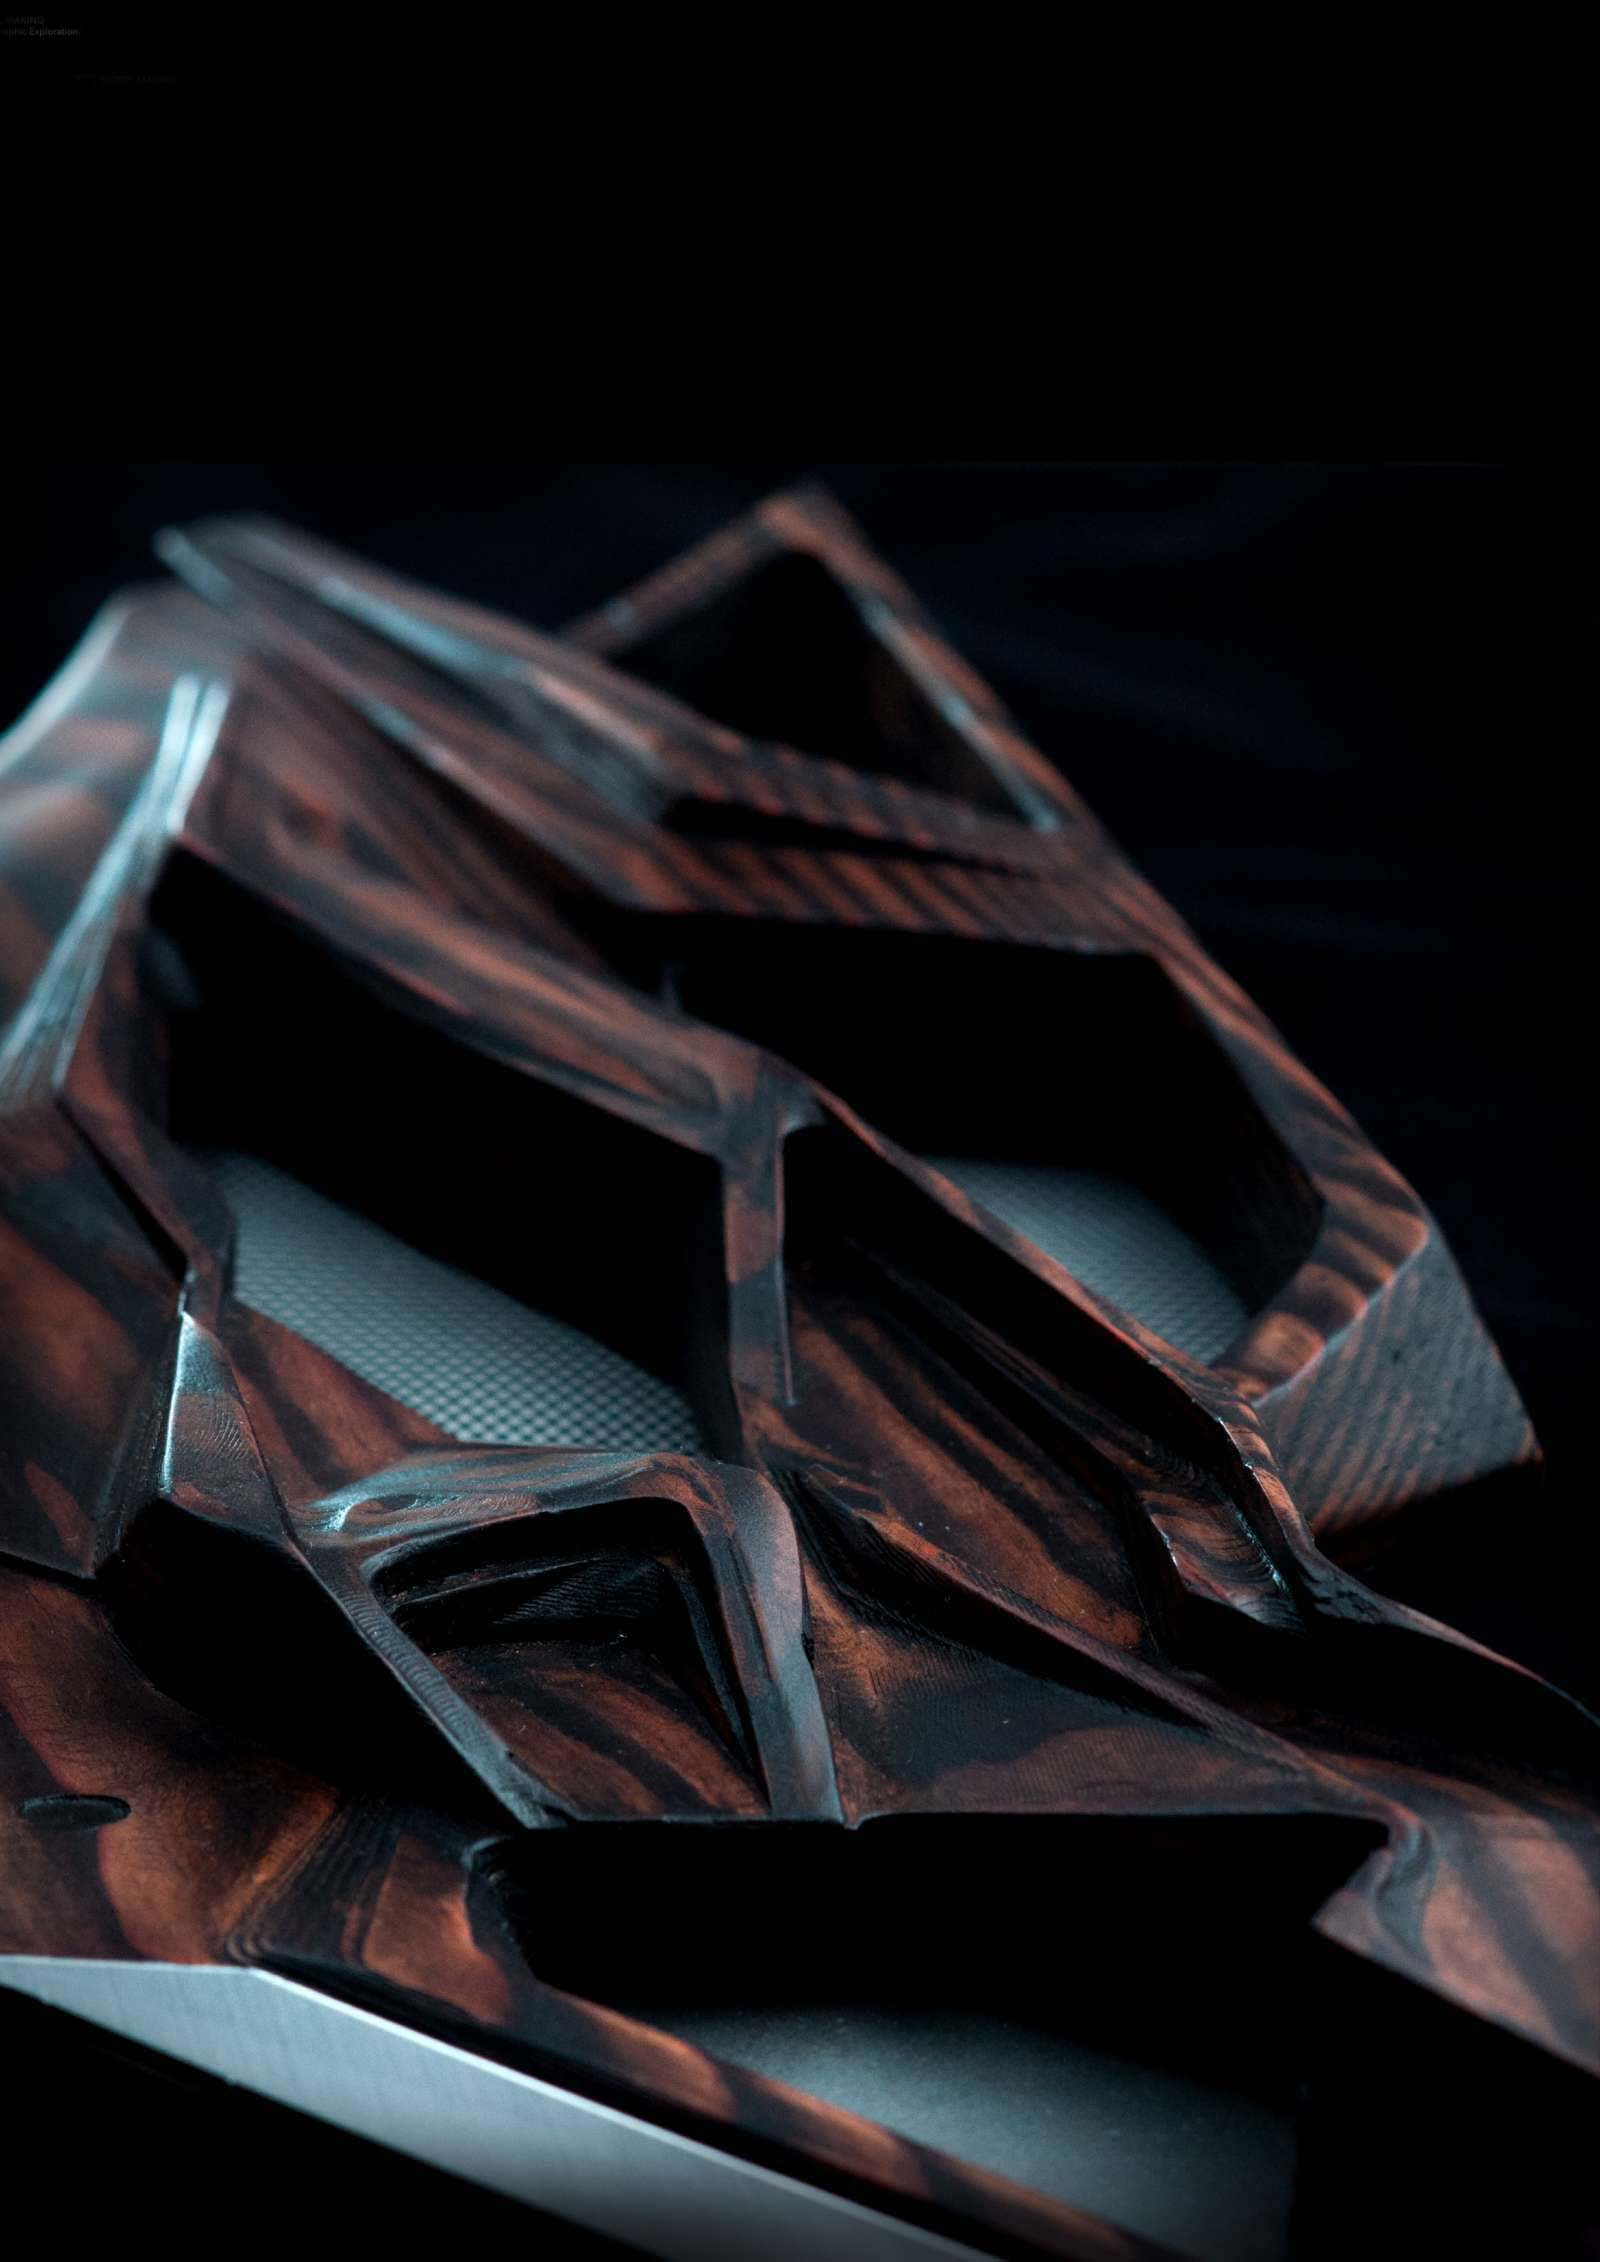 Matteo Mauro - Cuzco Architectural Sculpture